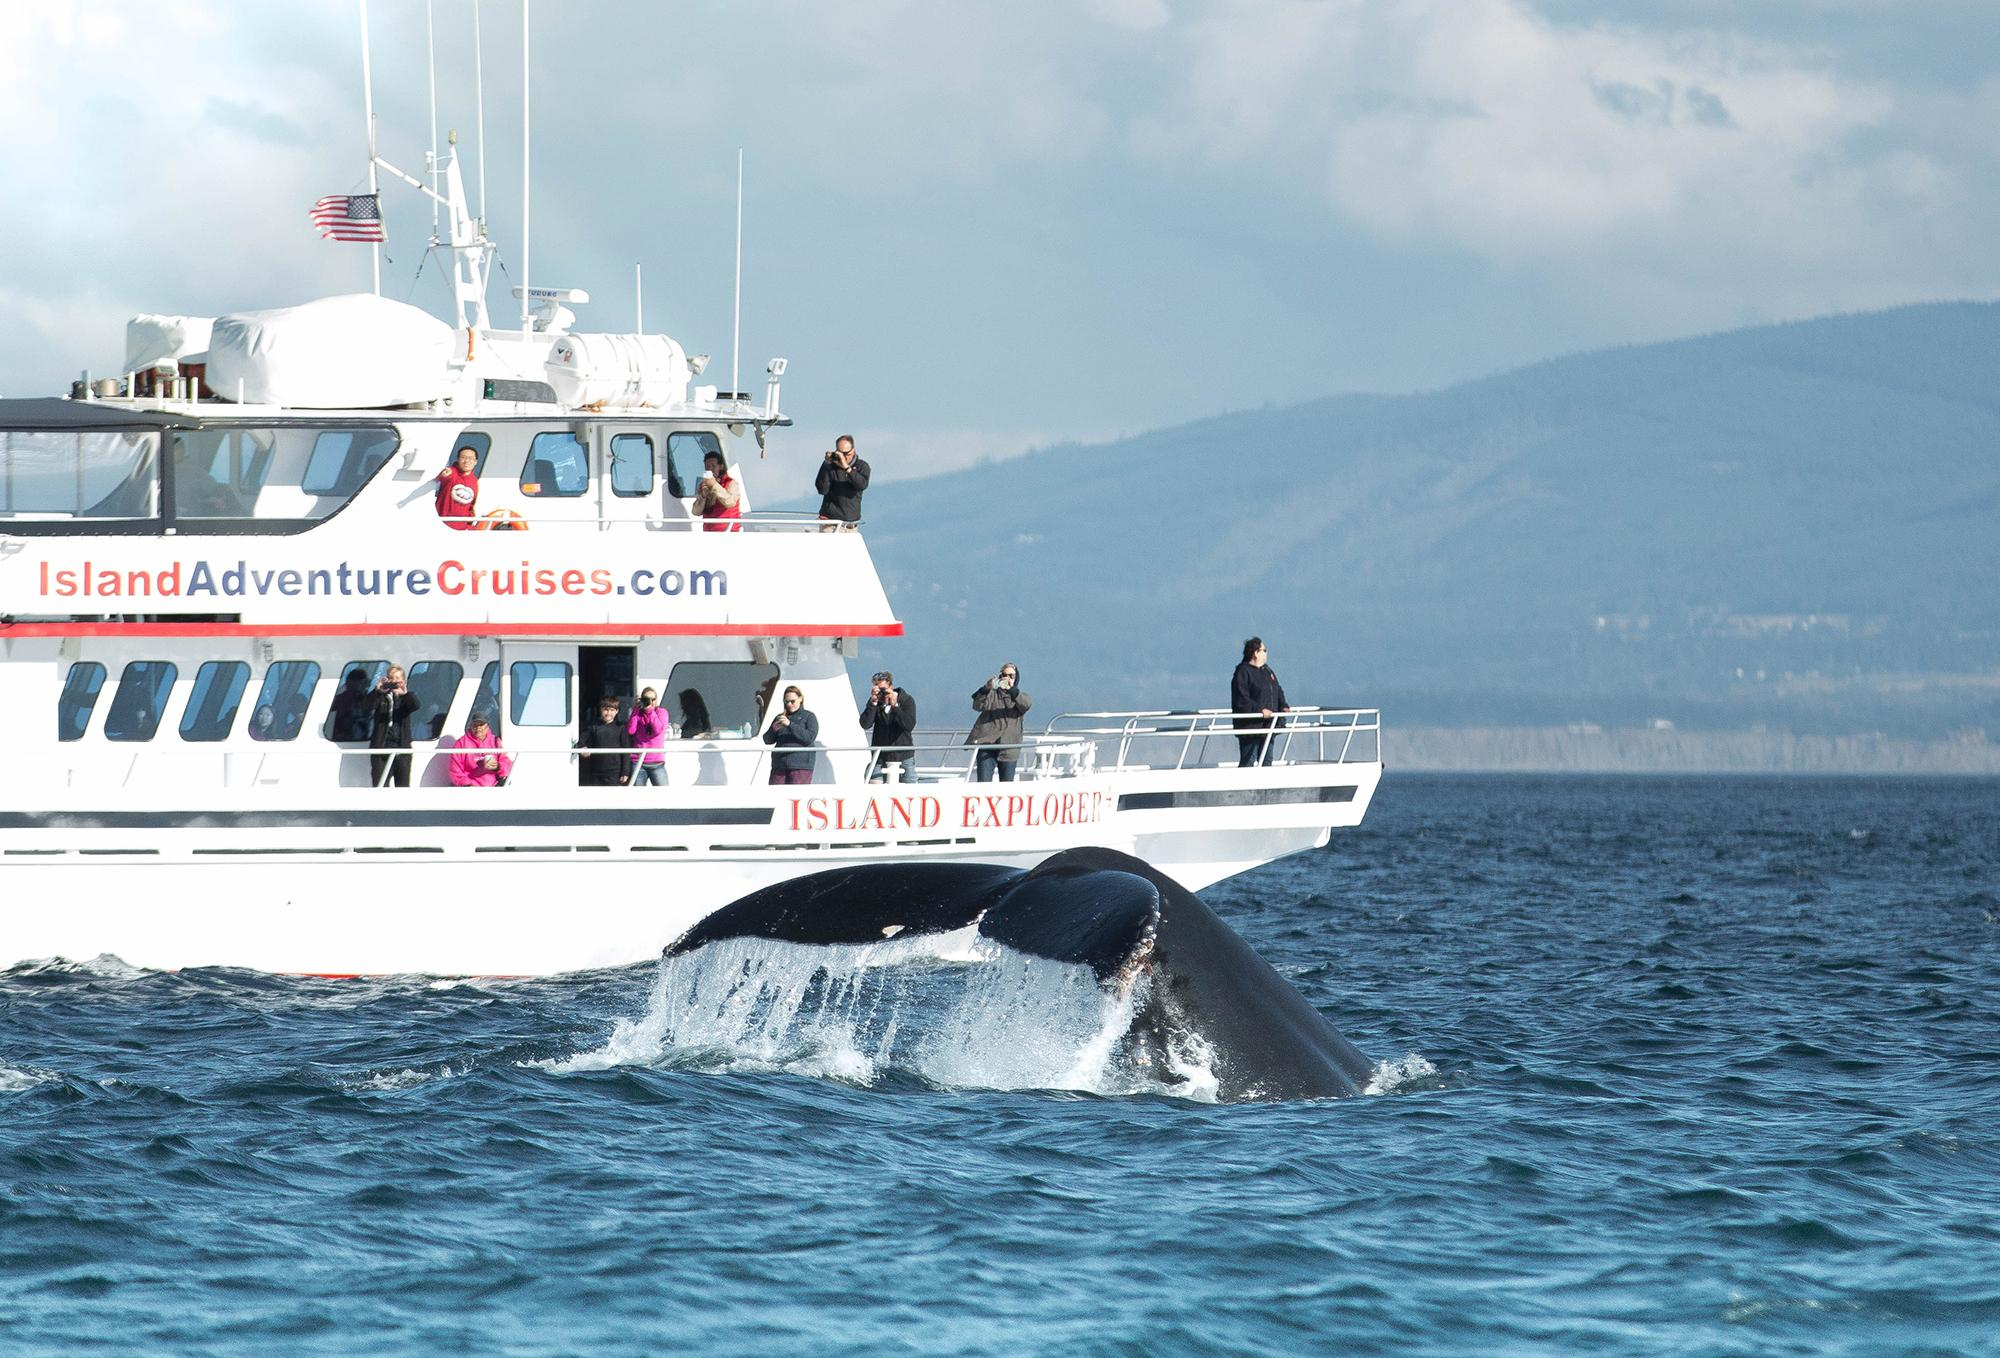 Whale-watch tours having 'epic season' near Port Angeles